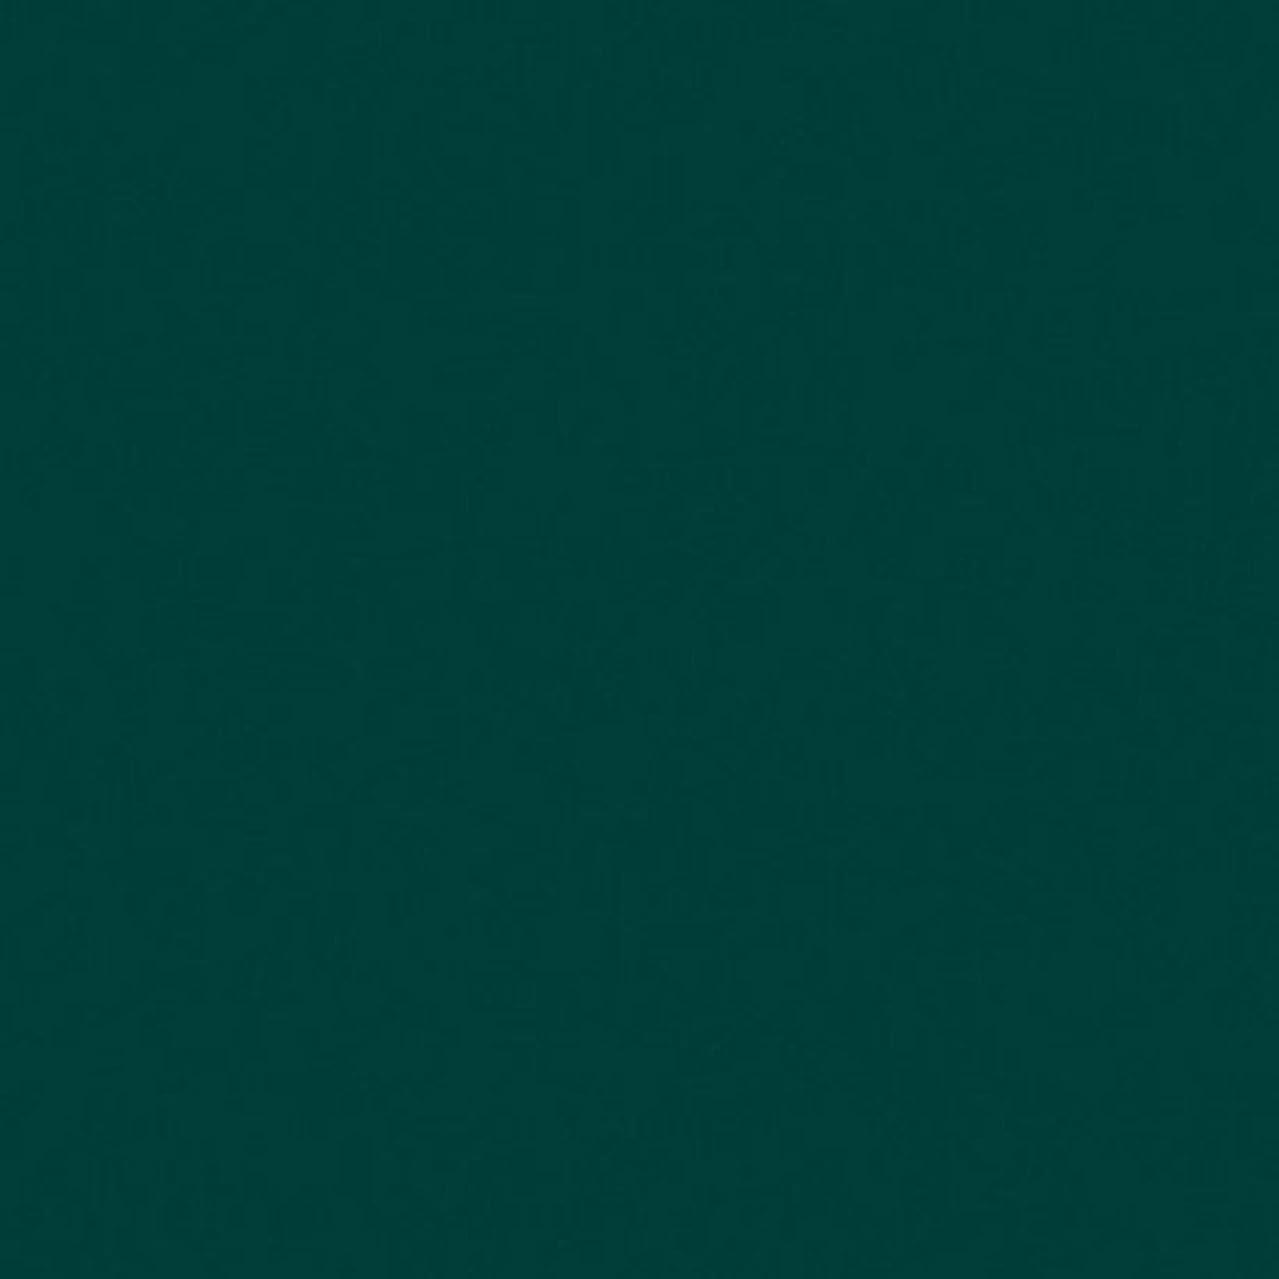 EFCOLOR 25 ml Dark Green, Resin 5 x 5 x 3 cm